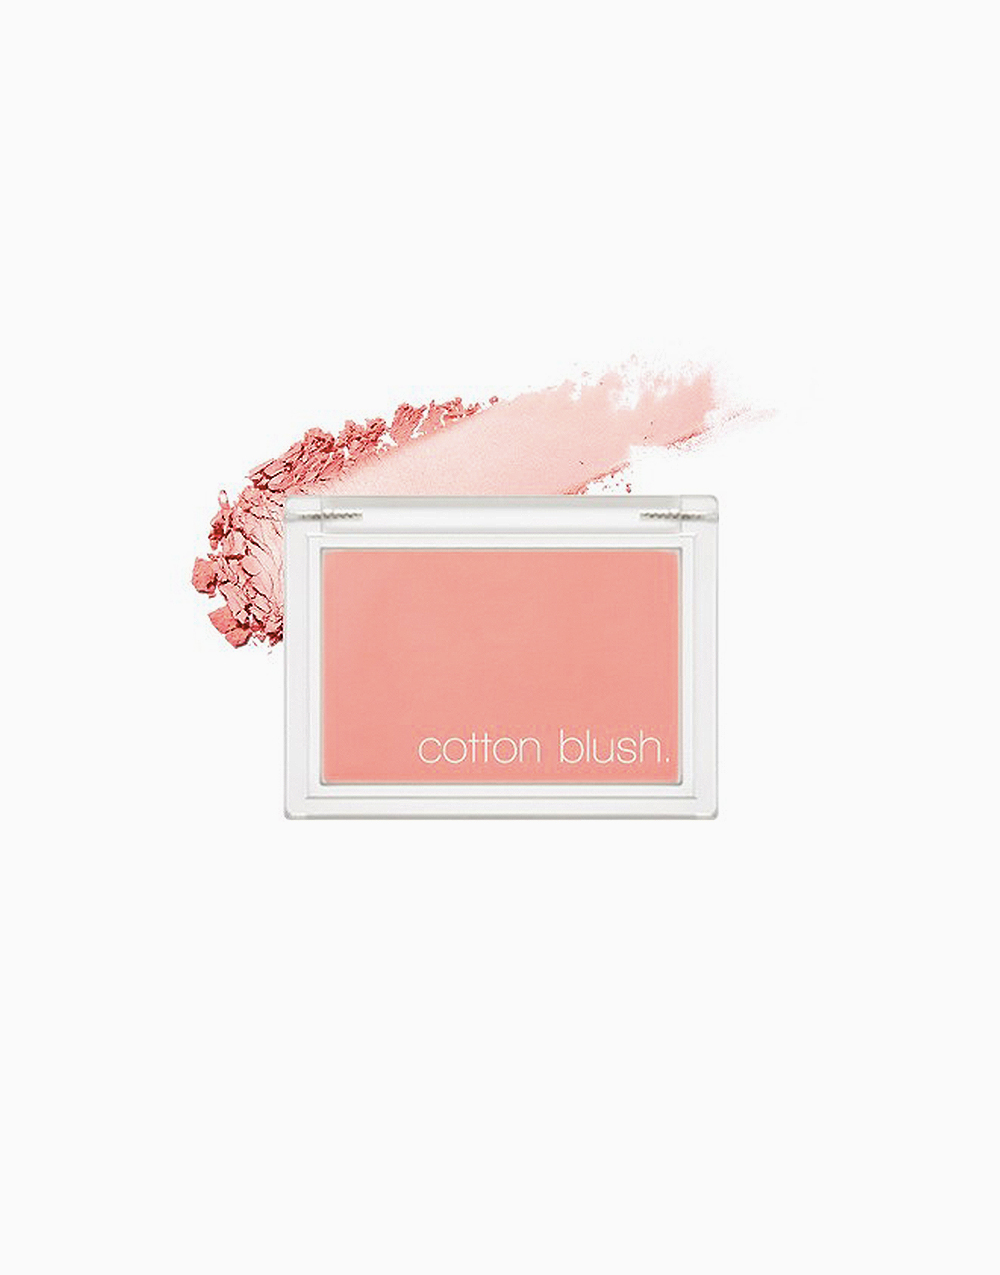 Cotton Blush by Missha | My Candyshop